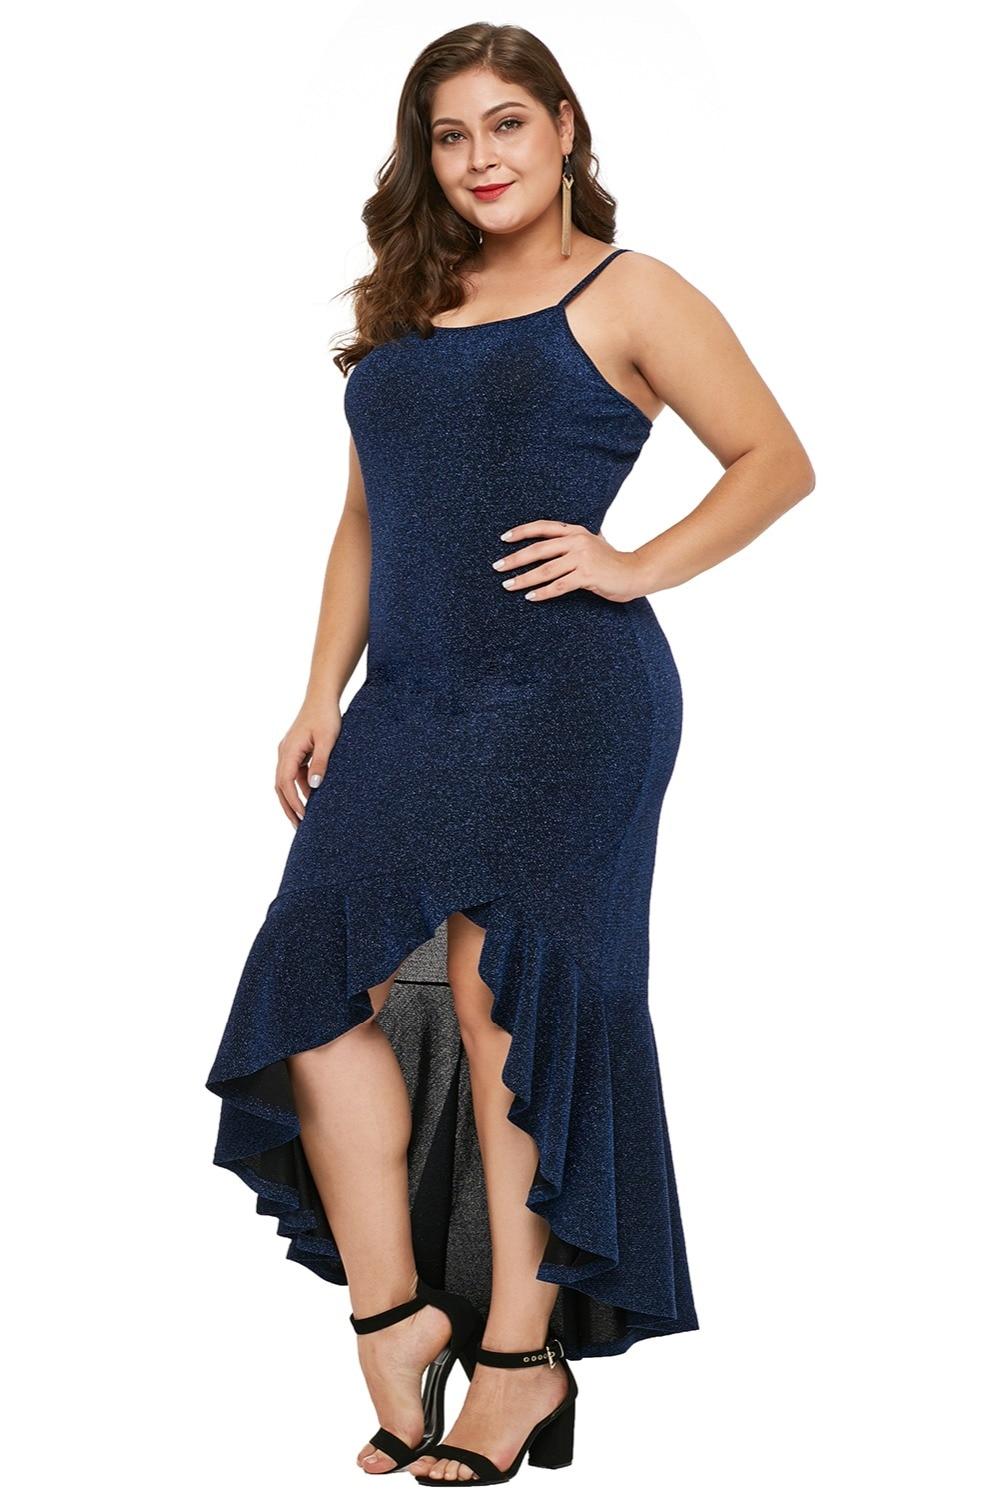 Navy-Blue-True-Shine-Plus-Size-High-low-Dress-LC610939-5-3